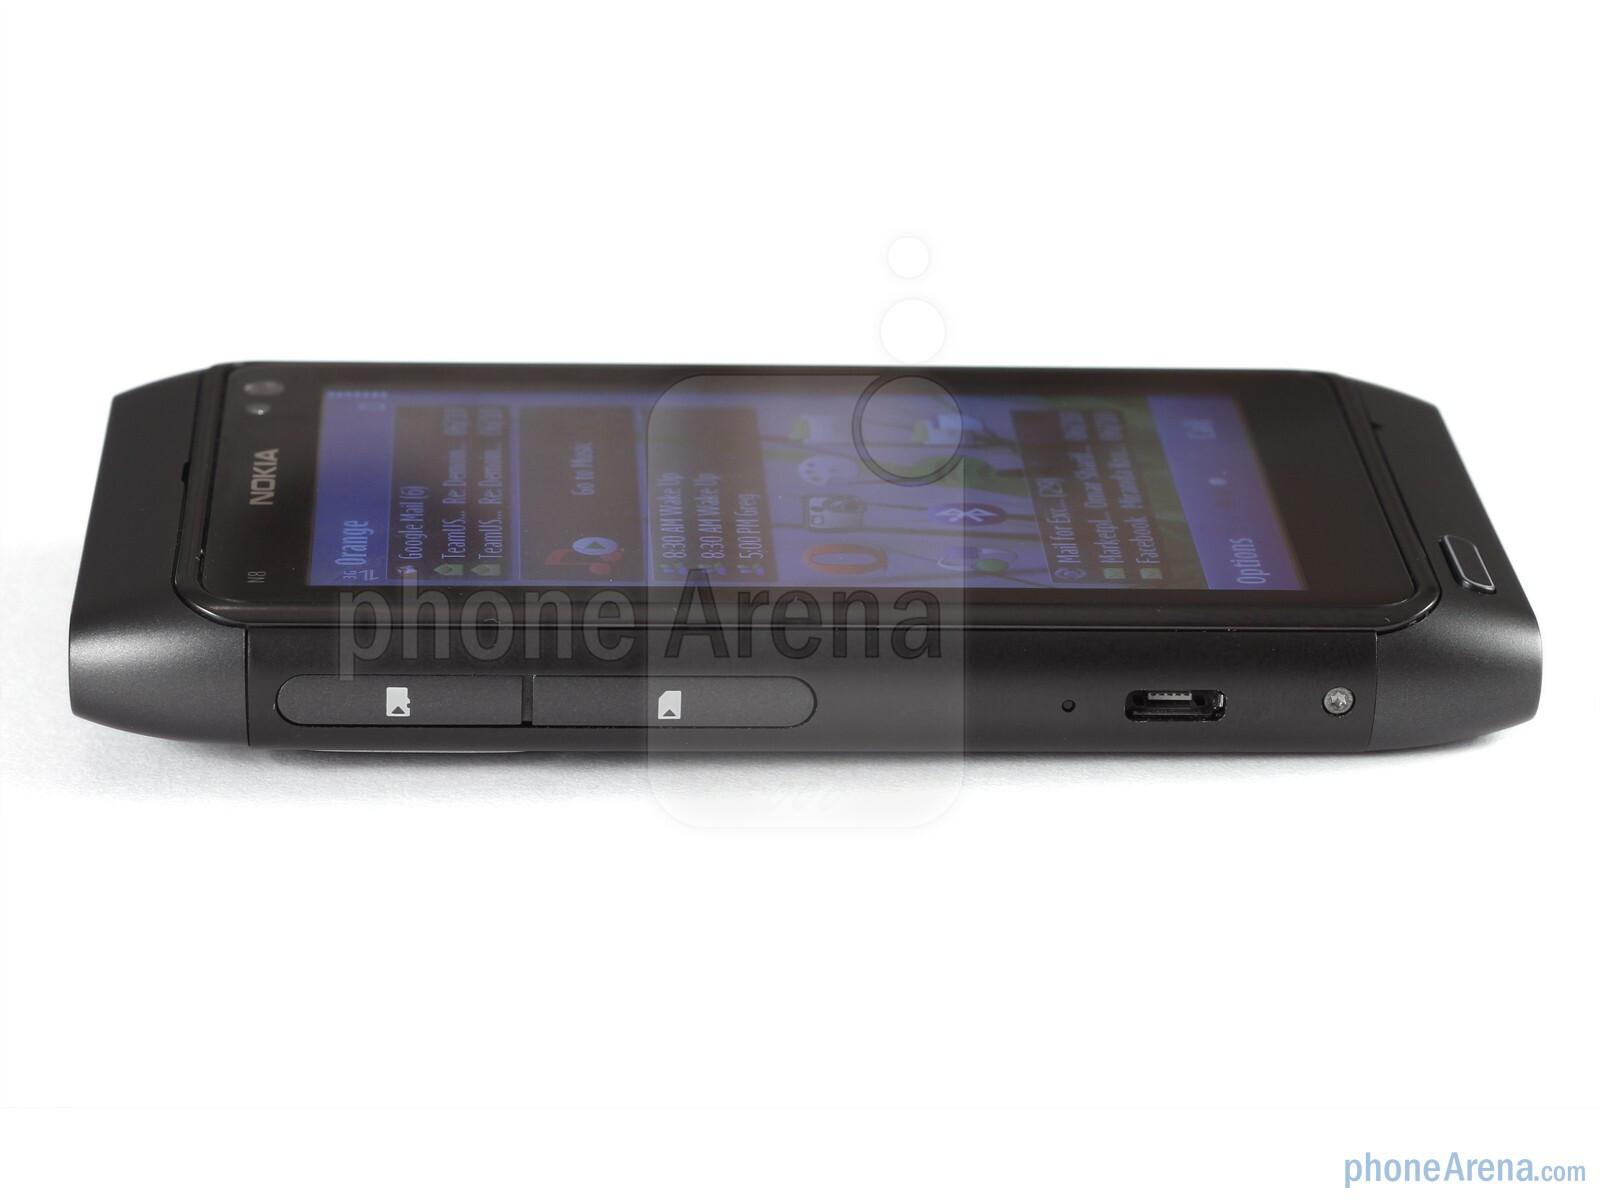 Nokia N8 Review - PhoneArena